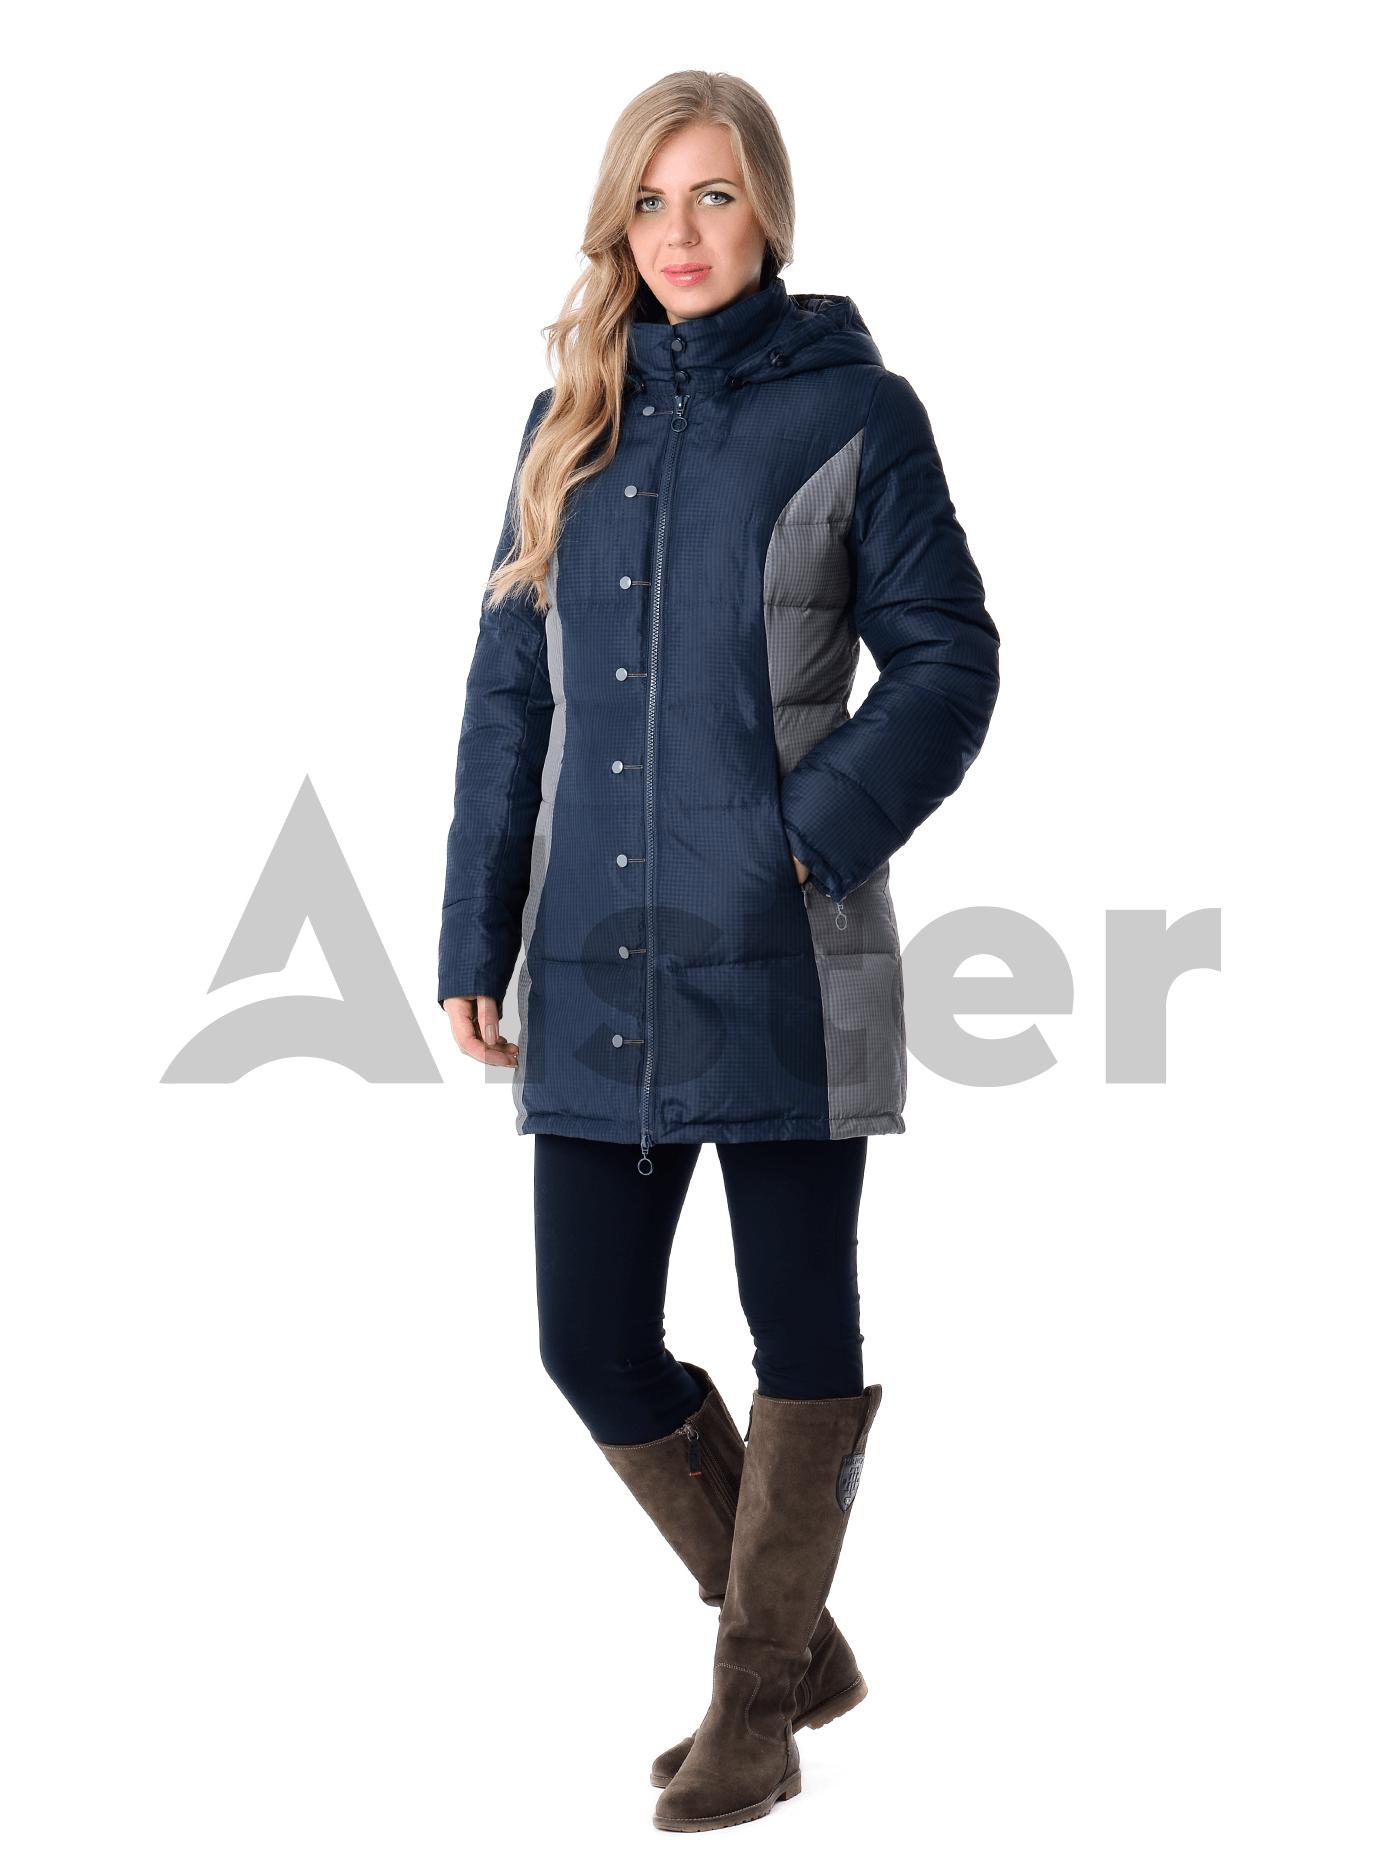 Куртка зимняя средней длины Тёмно-синий S (04-CC19100): фото - Alster.ua